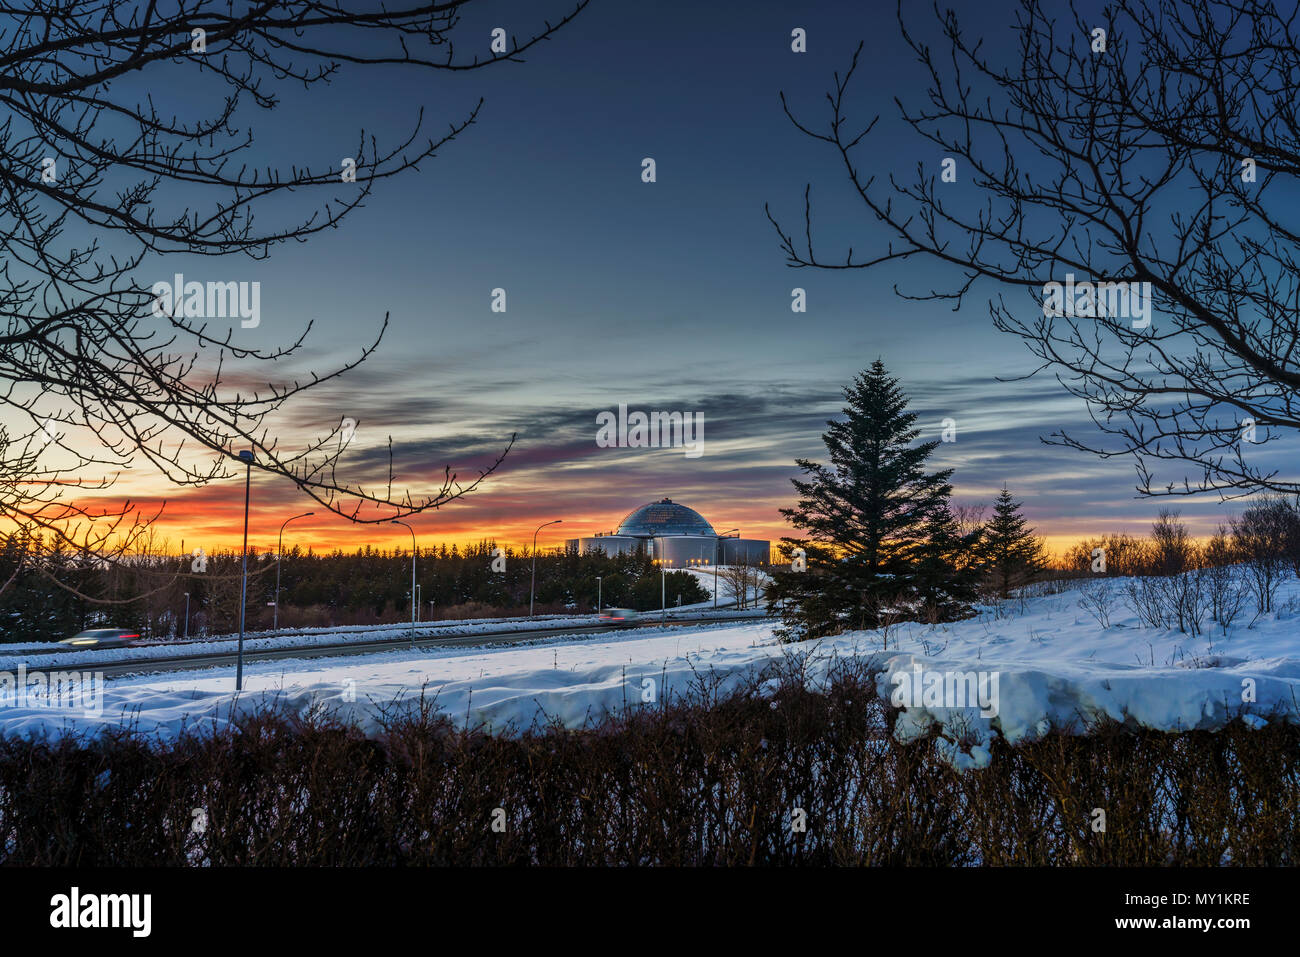 Perlan (La Perle) au coucher du soleil, l'hiver, Reykjavik, Islande Photo Stock